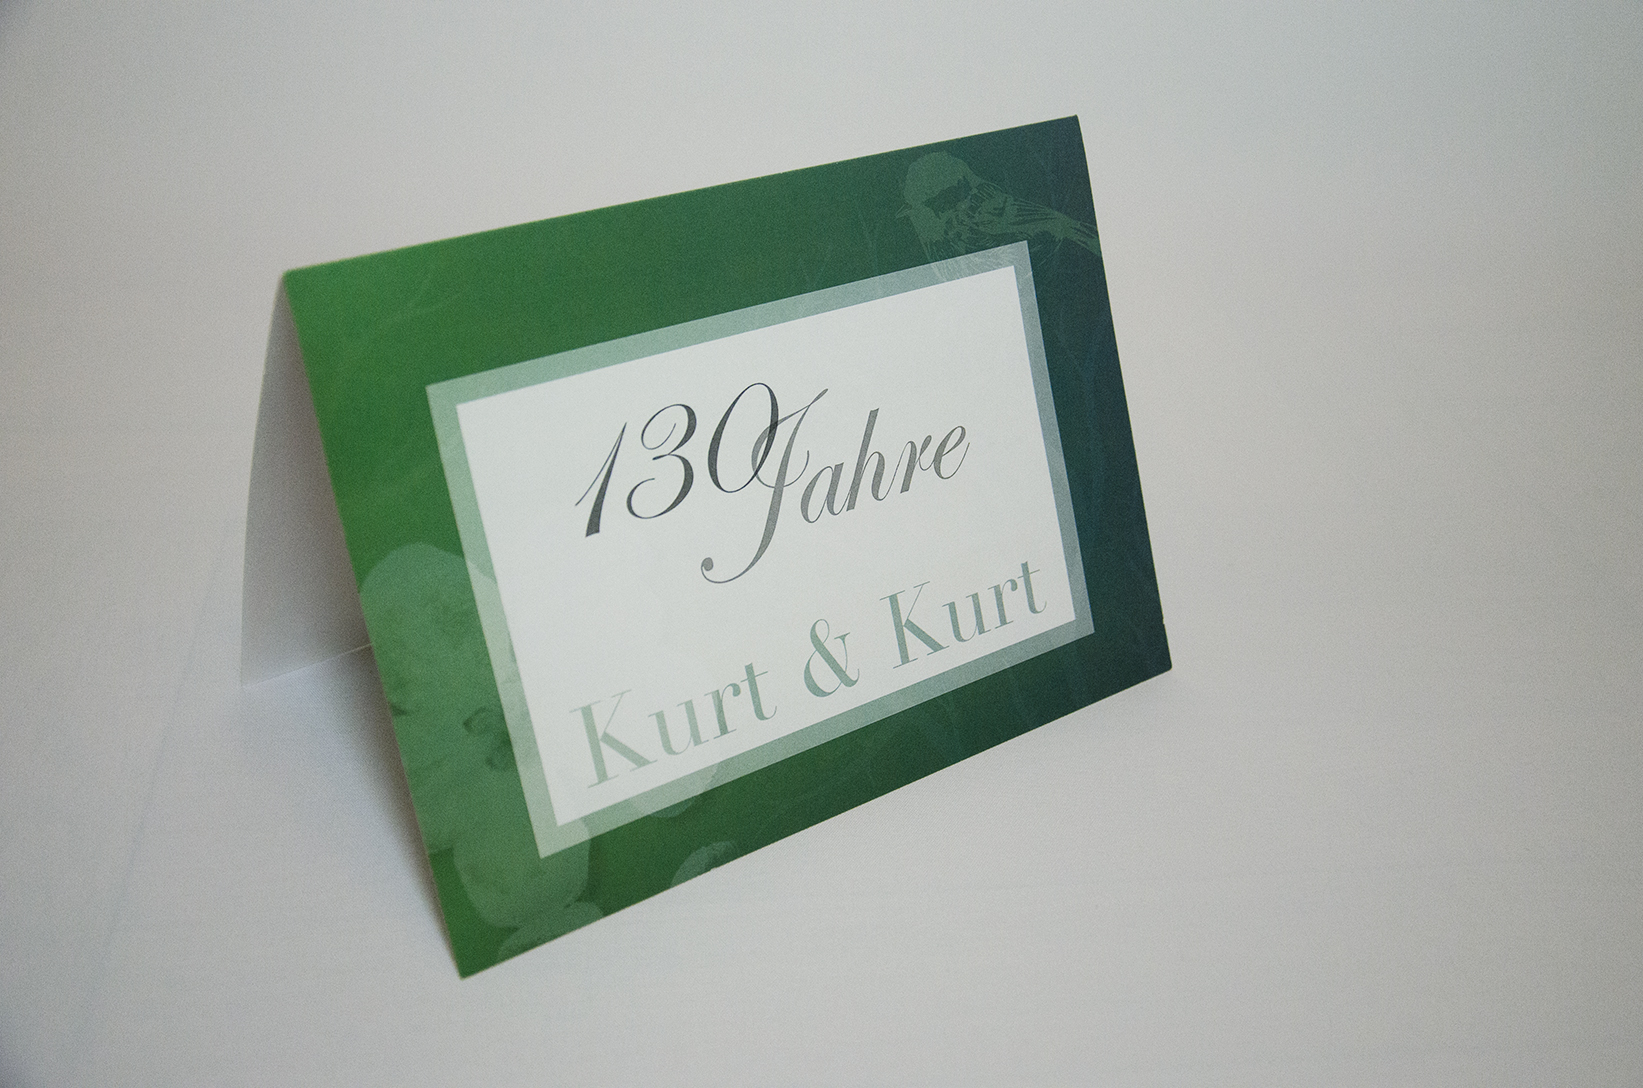 Einladung 130 Jahre Kurt&Kurt